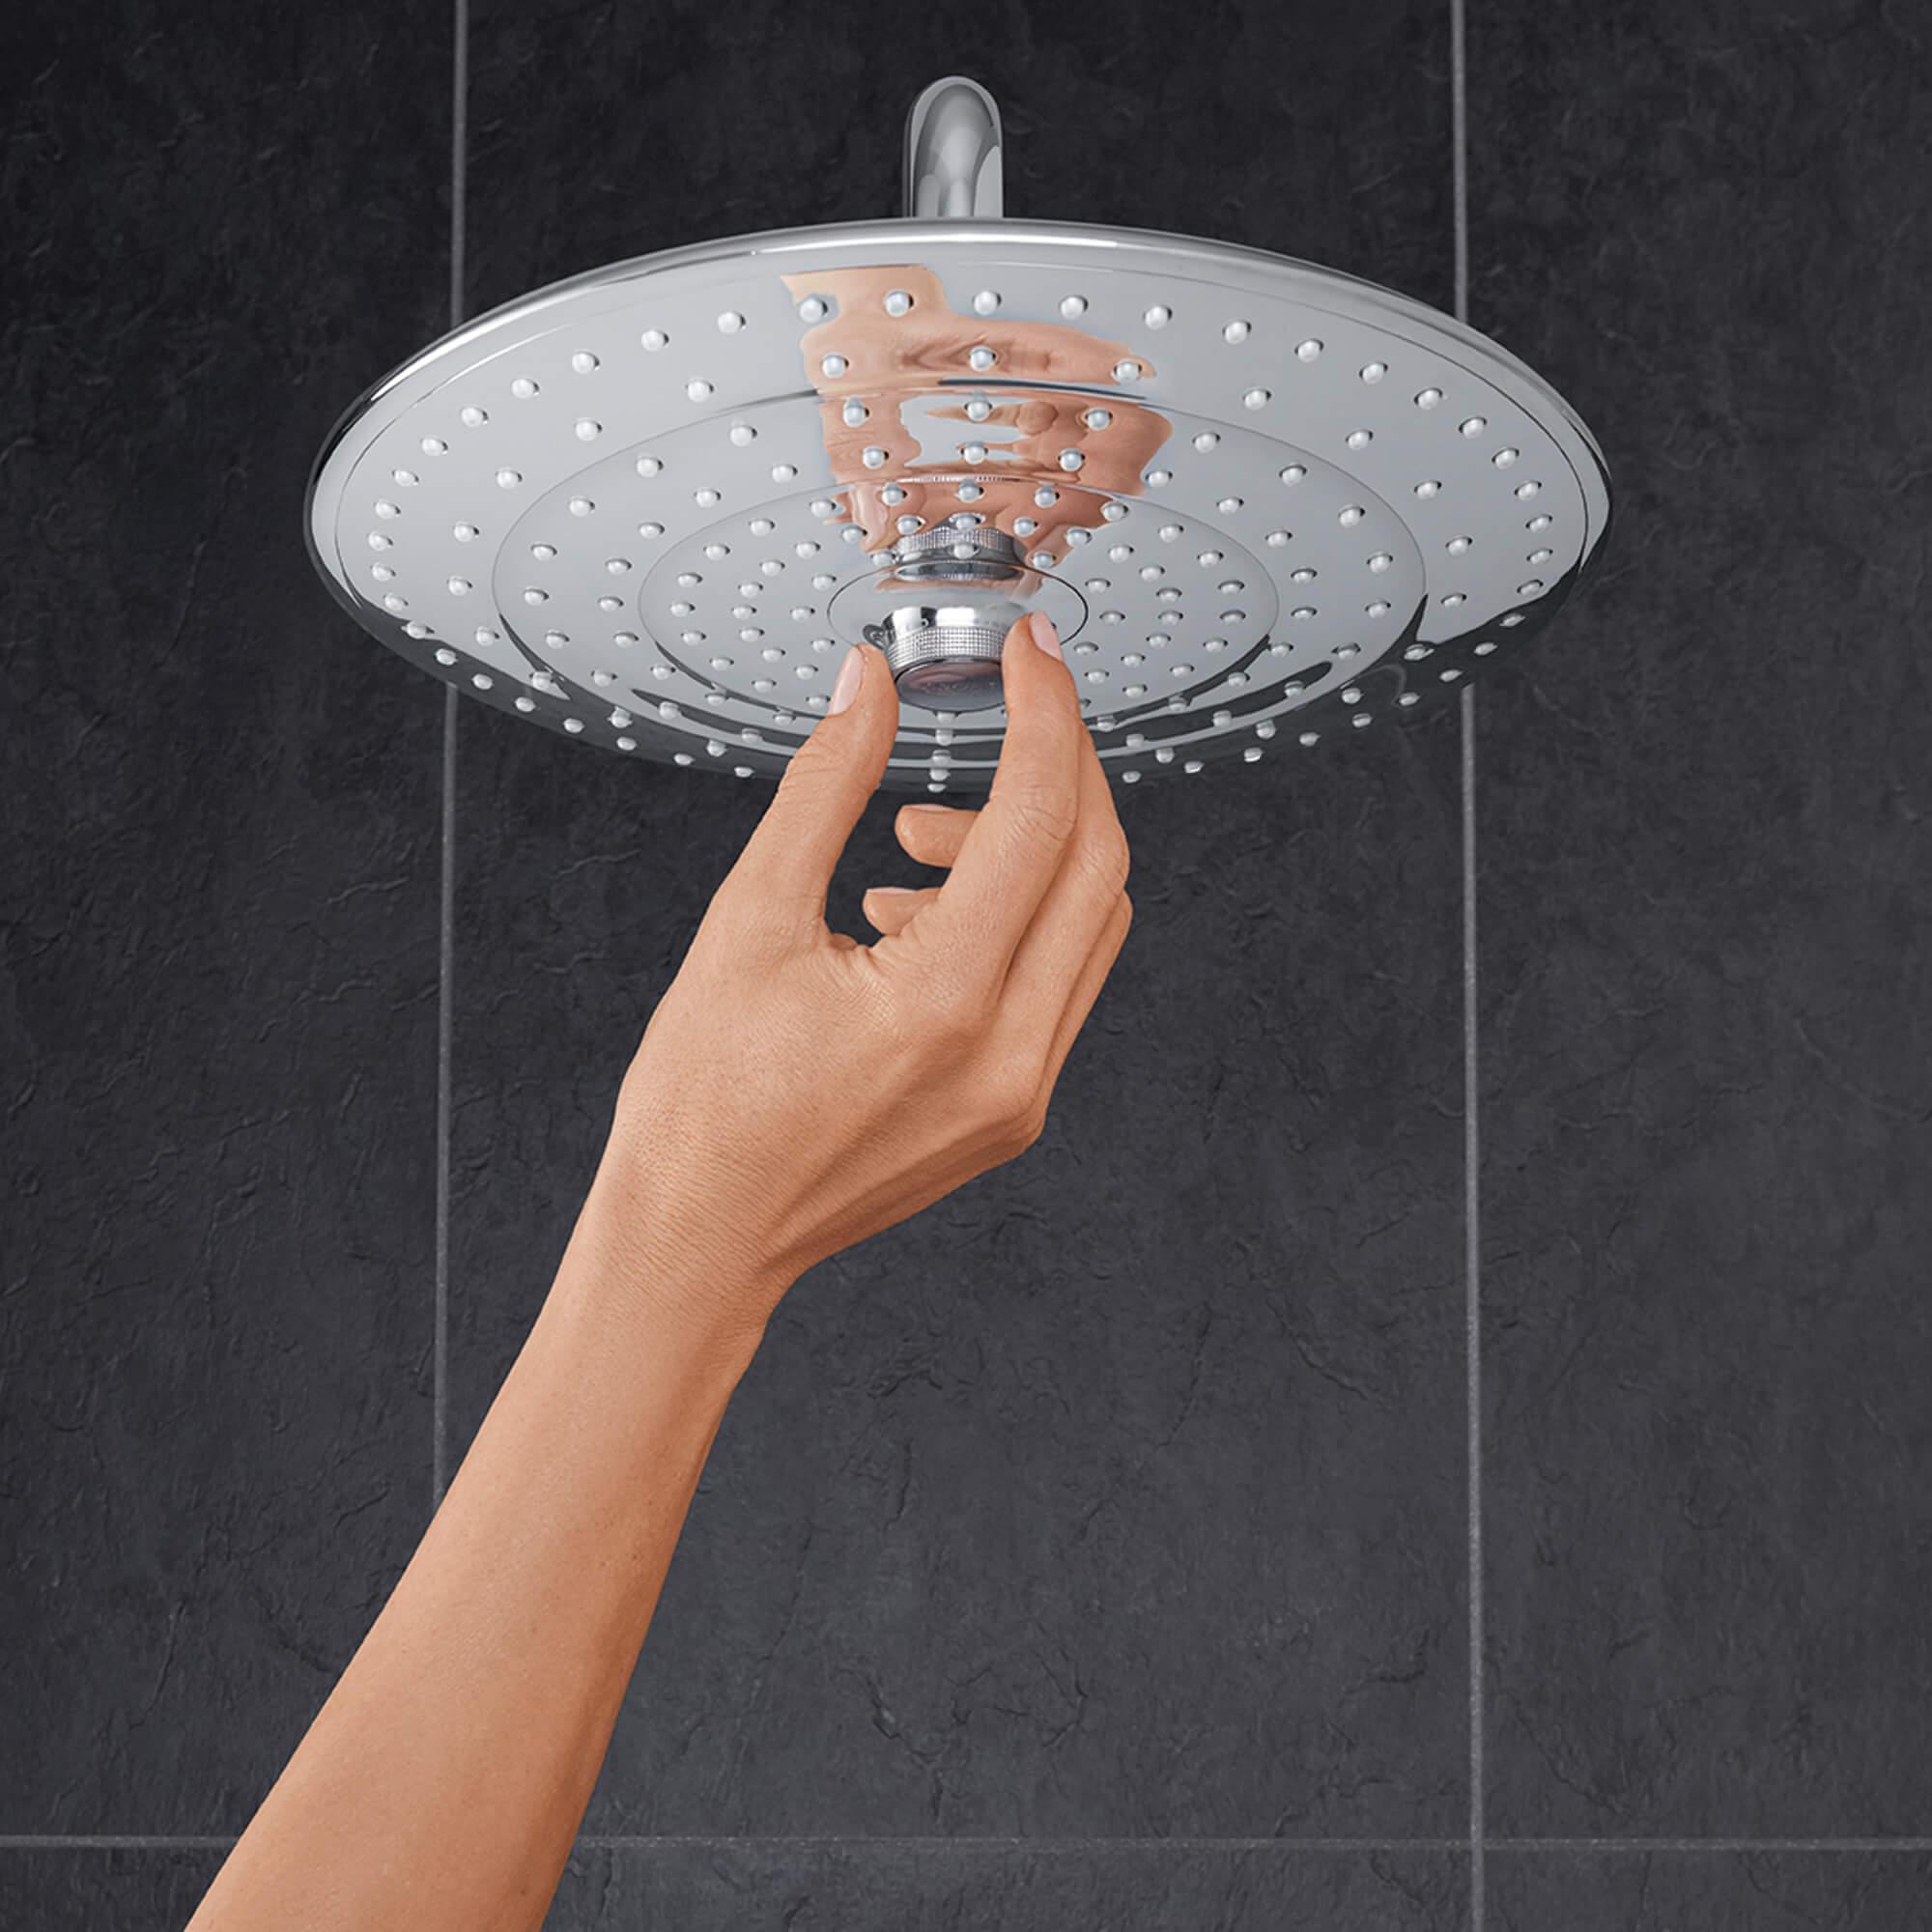 Hand adjusting centerpiece of Euphoria shower head